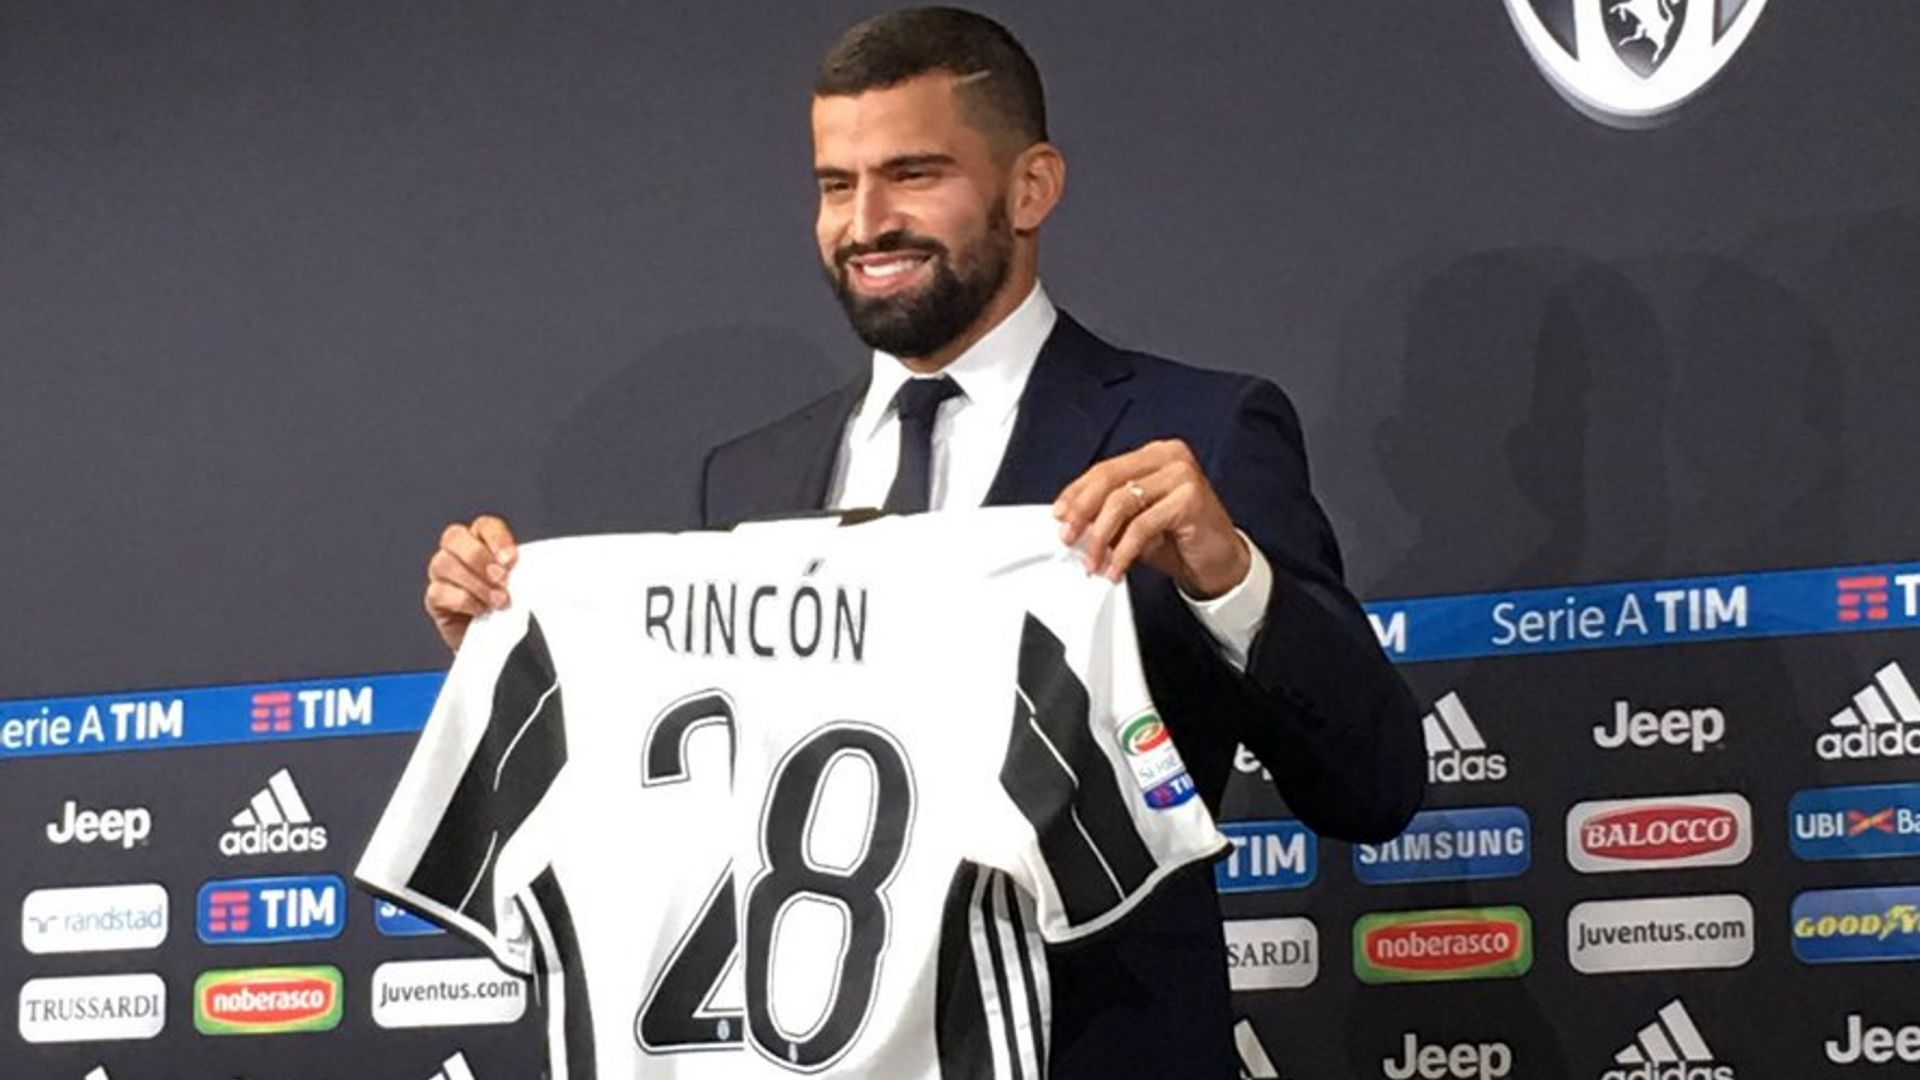 Rincon: